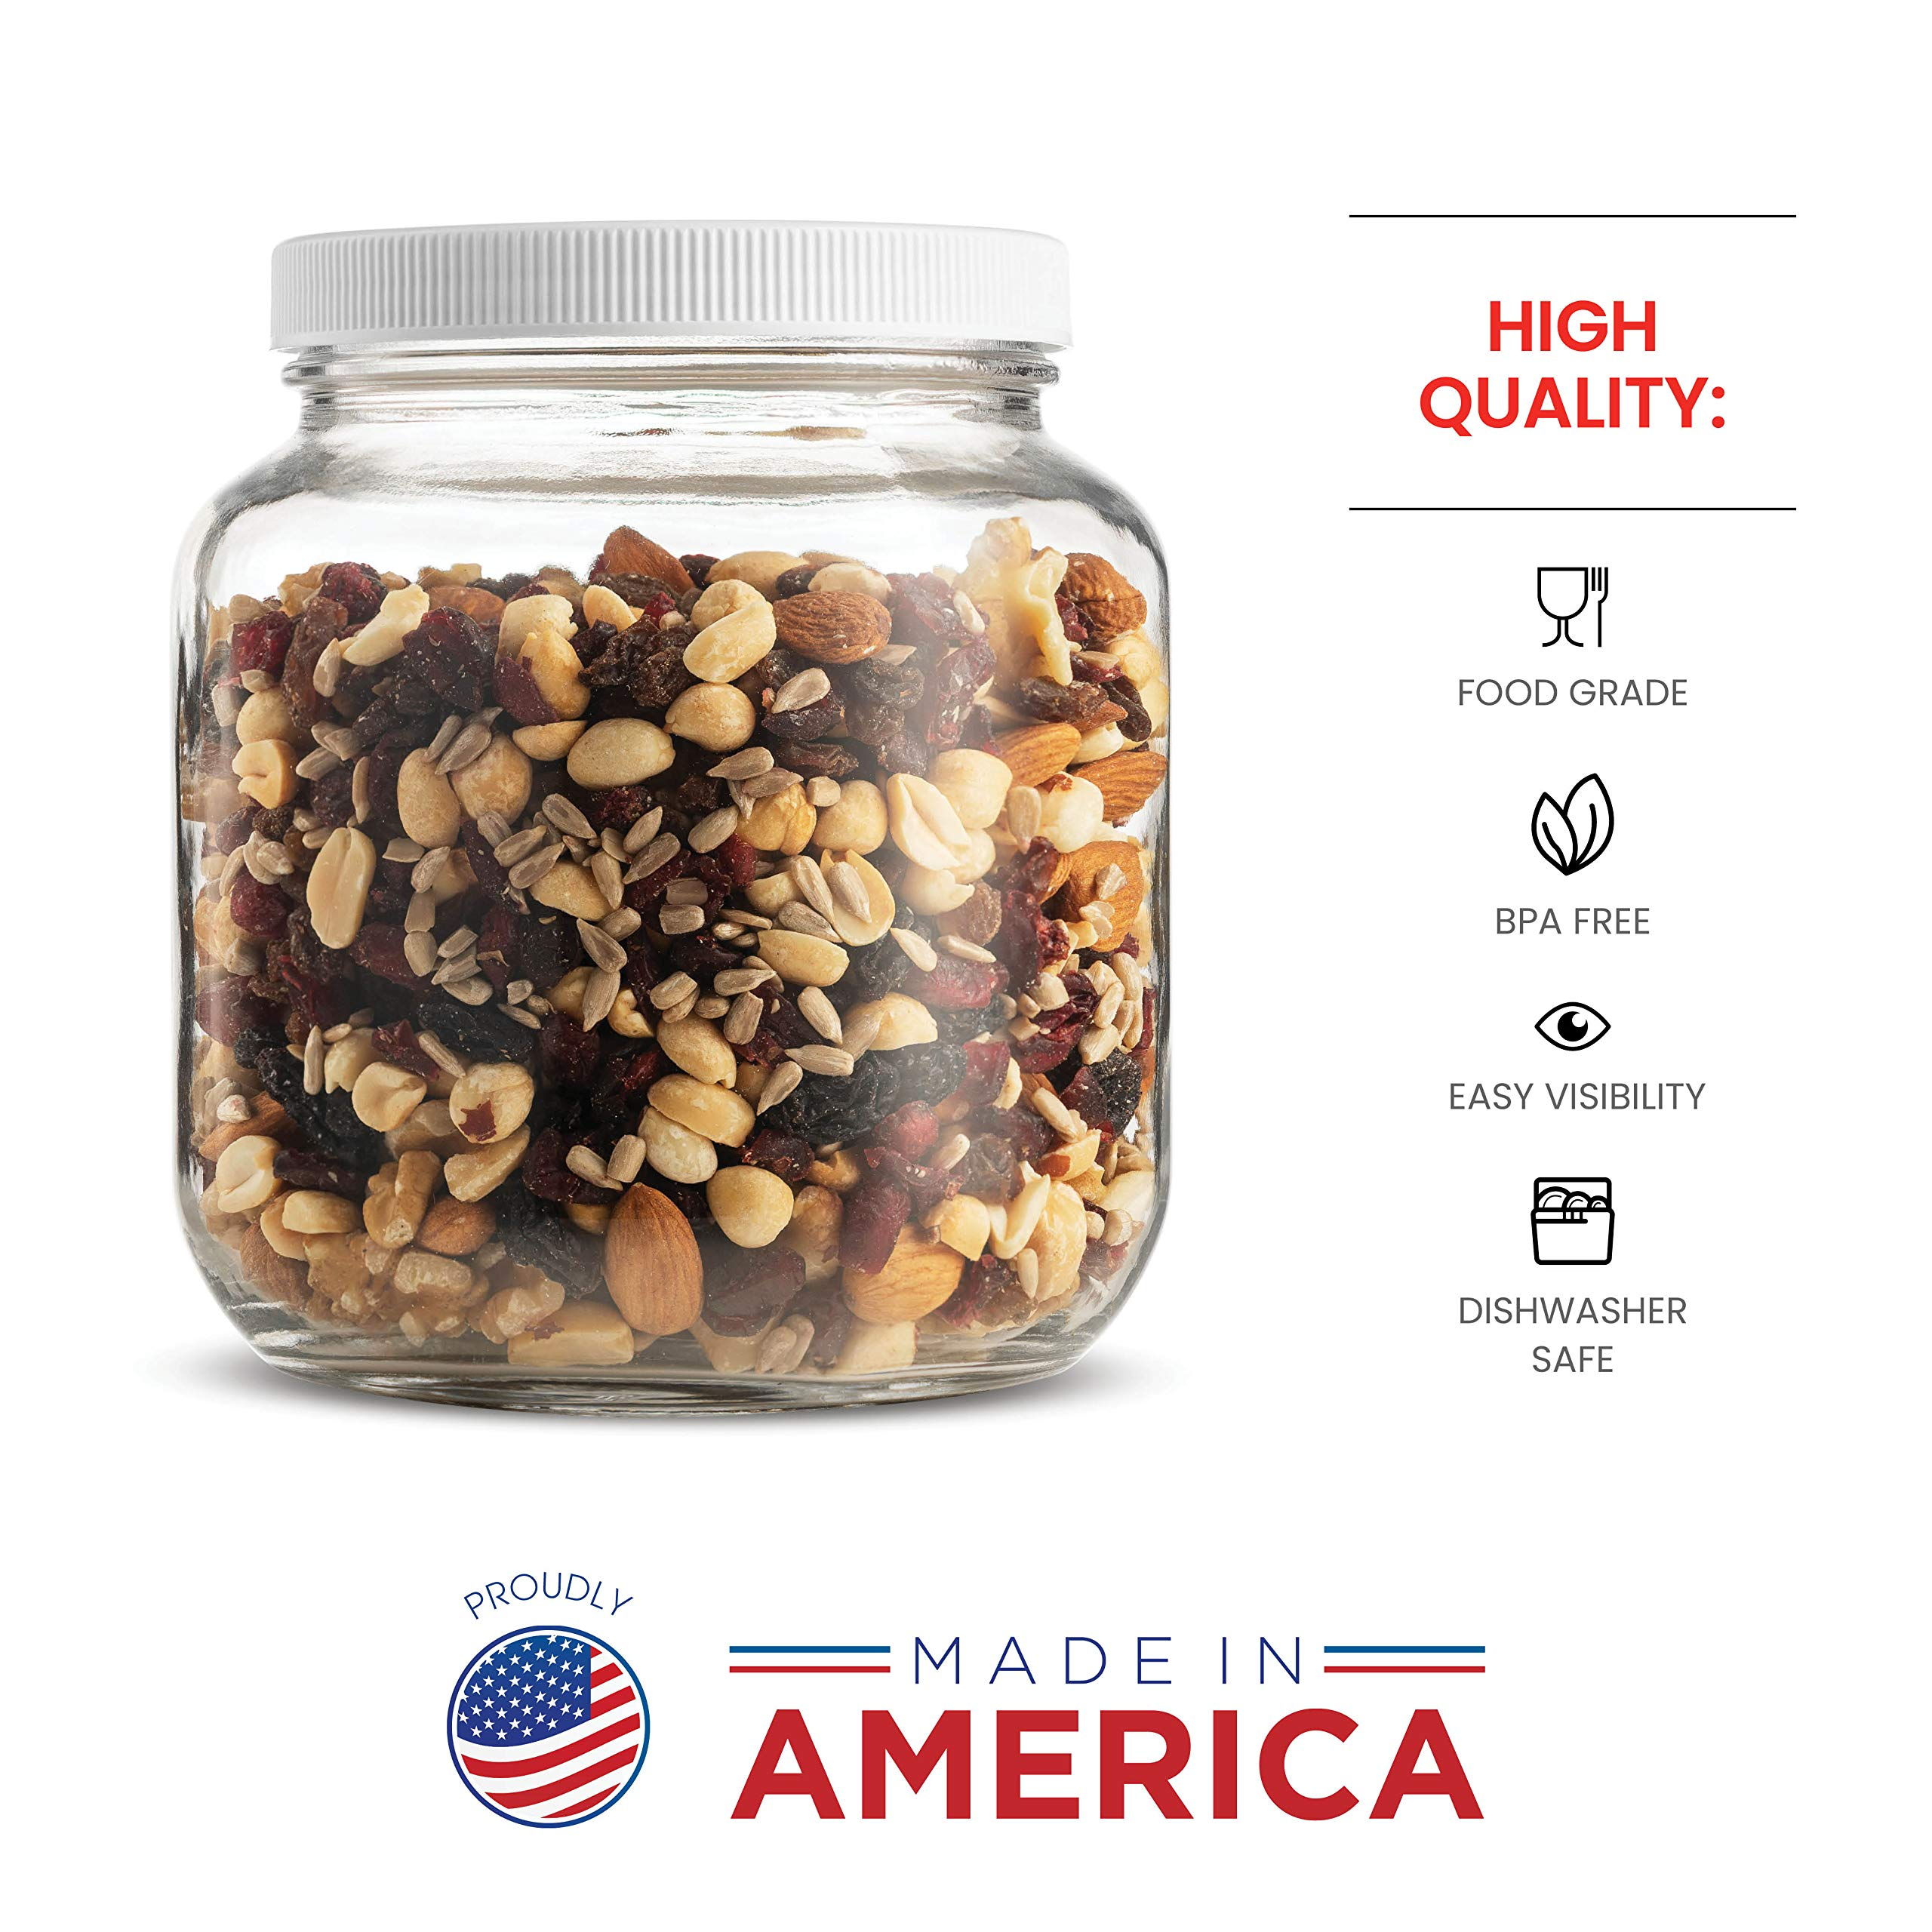 Half Gallon Glass Mason Jar (64 Oz - 2 Quart) - 4 Pack - Wide Mouth, Plastic Airtight Lid, USDA Approved BPA-Free Dishwasher Safe Canning Jar for Fermenting, Sun Tea, Kombucha, Dry Food Storage, Clear by Paksh Novelty (Image #4)